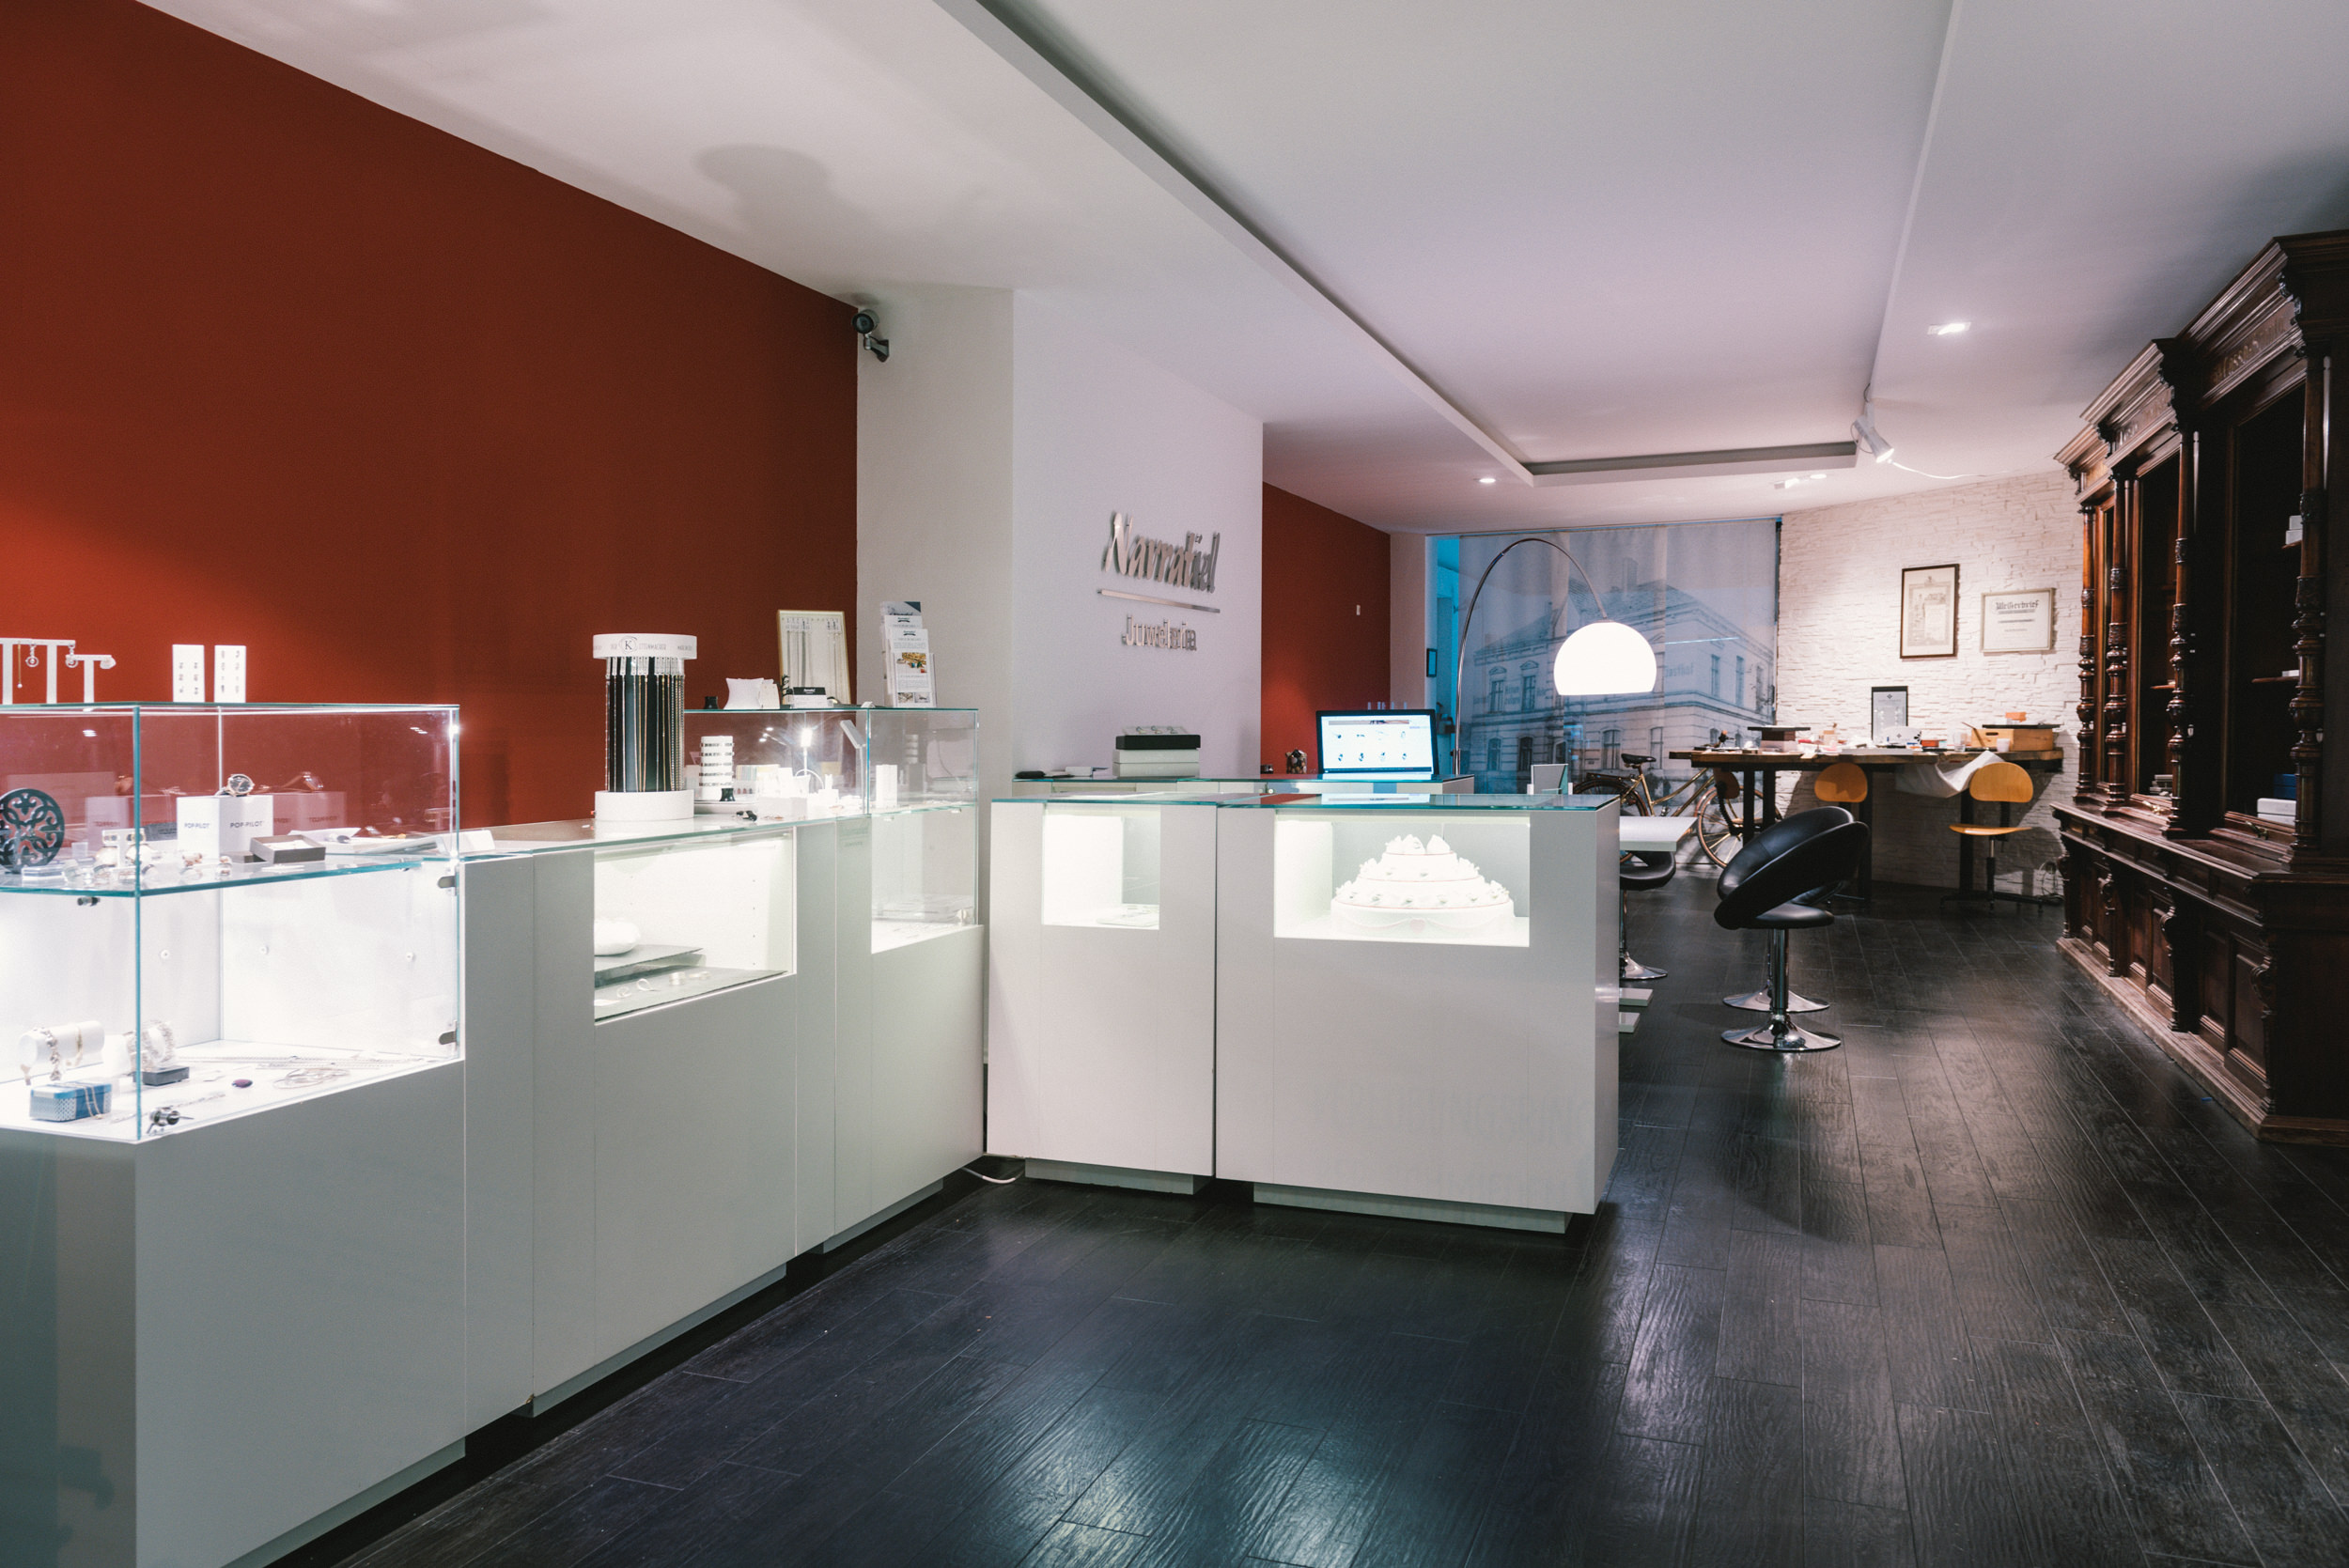 Juweleria_Navratiel_2018_WEB-019